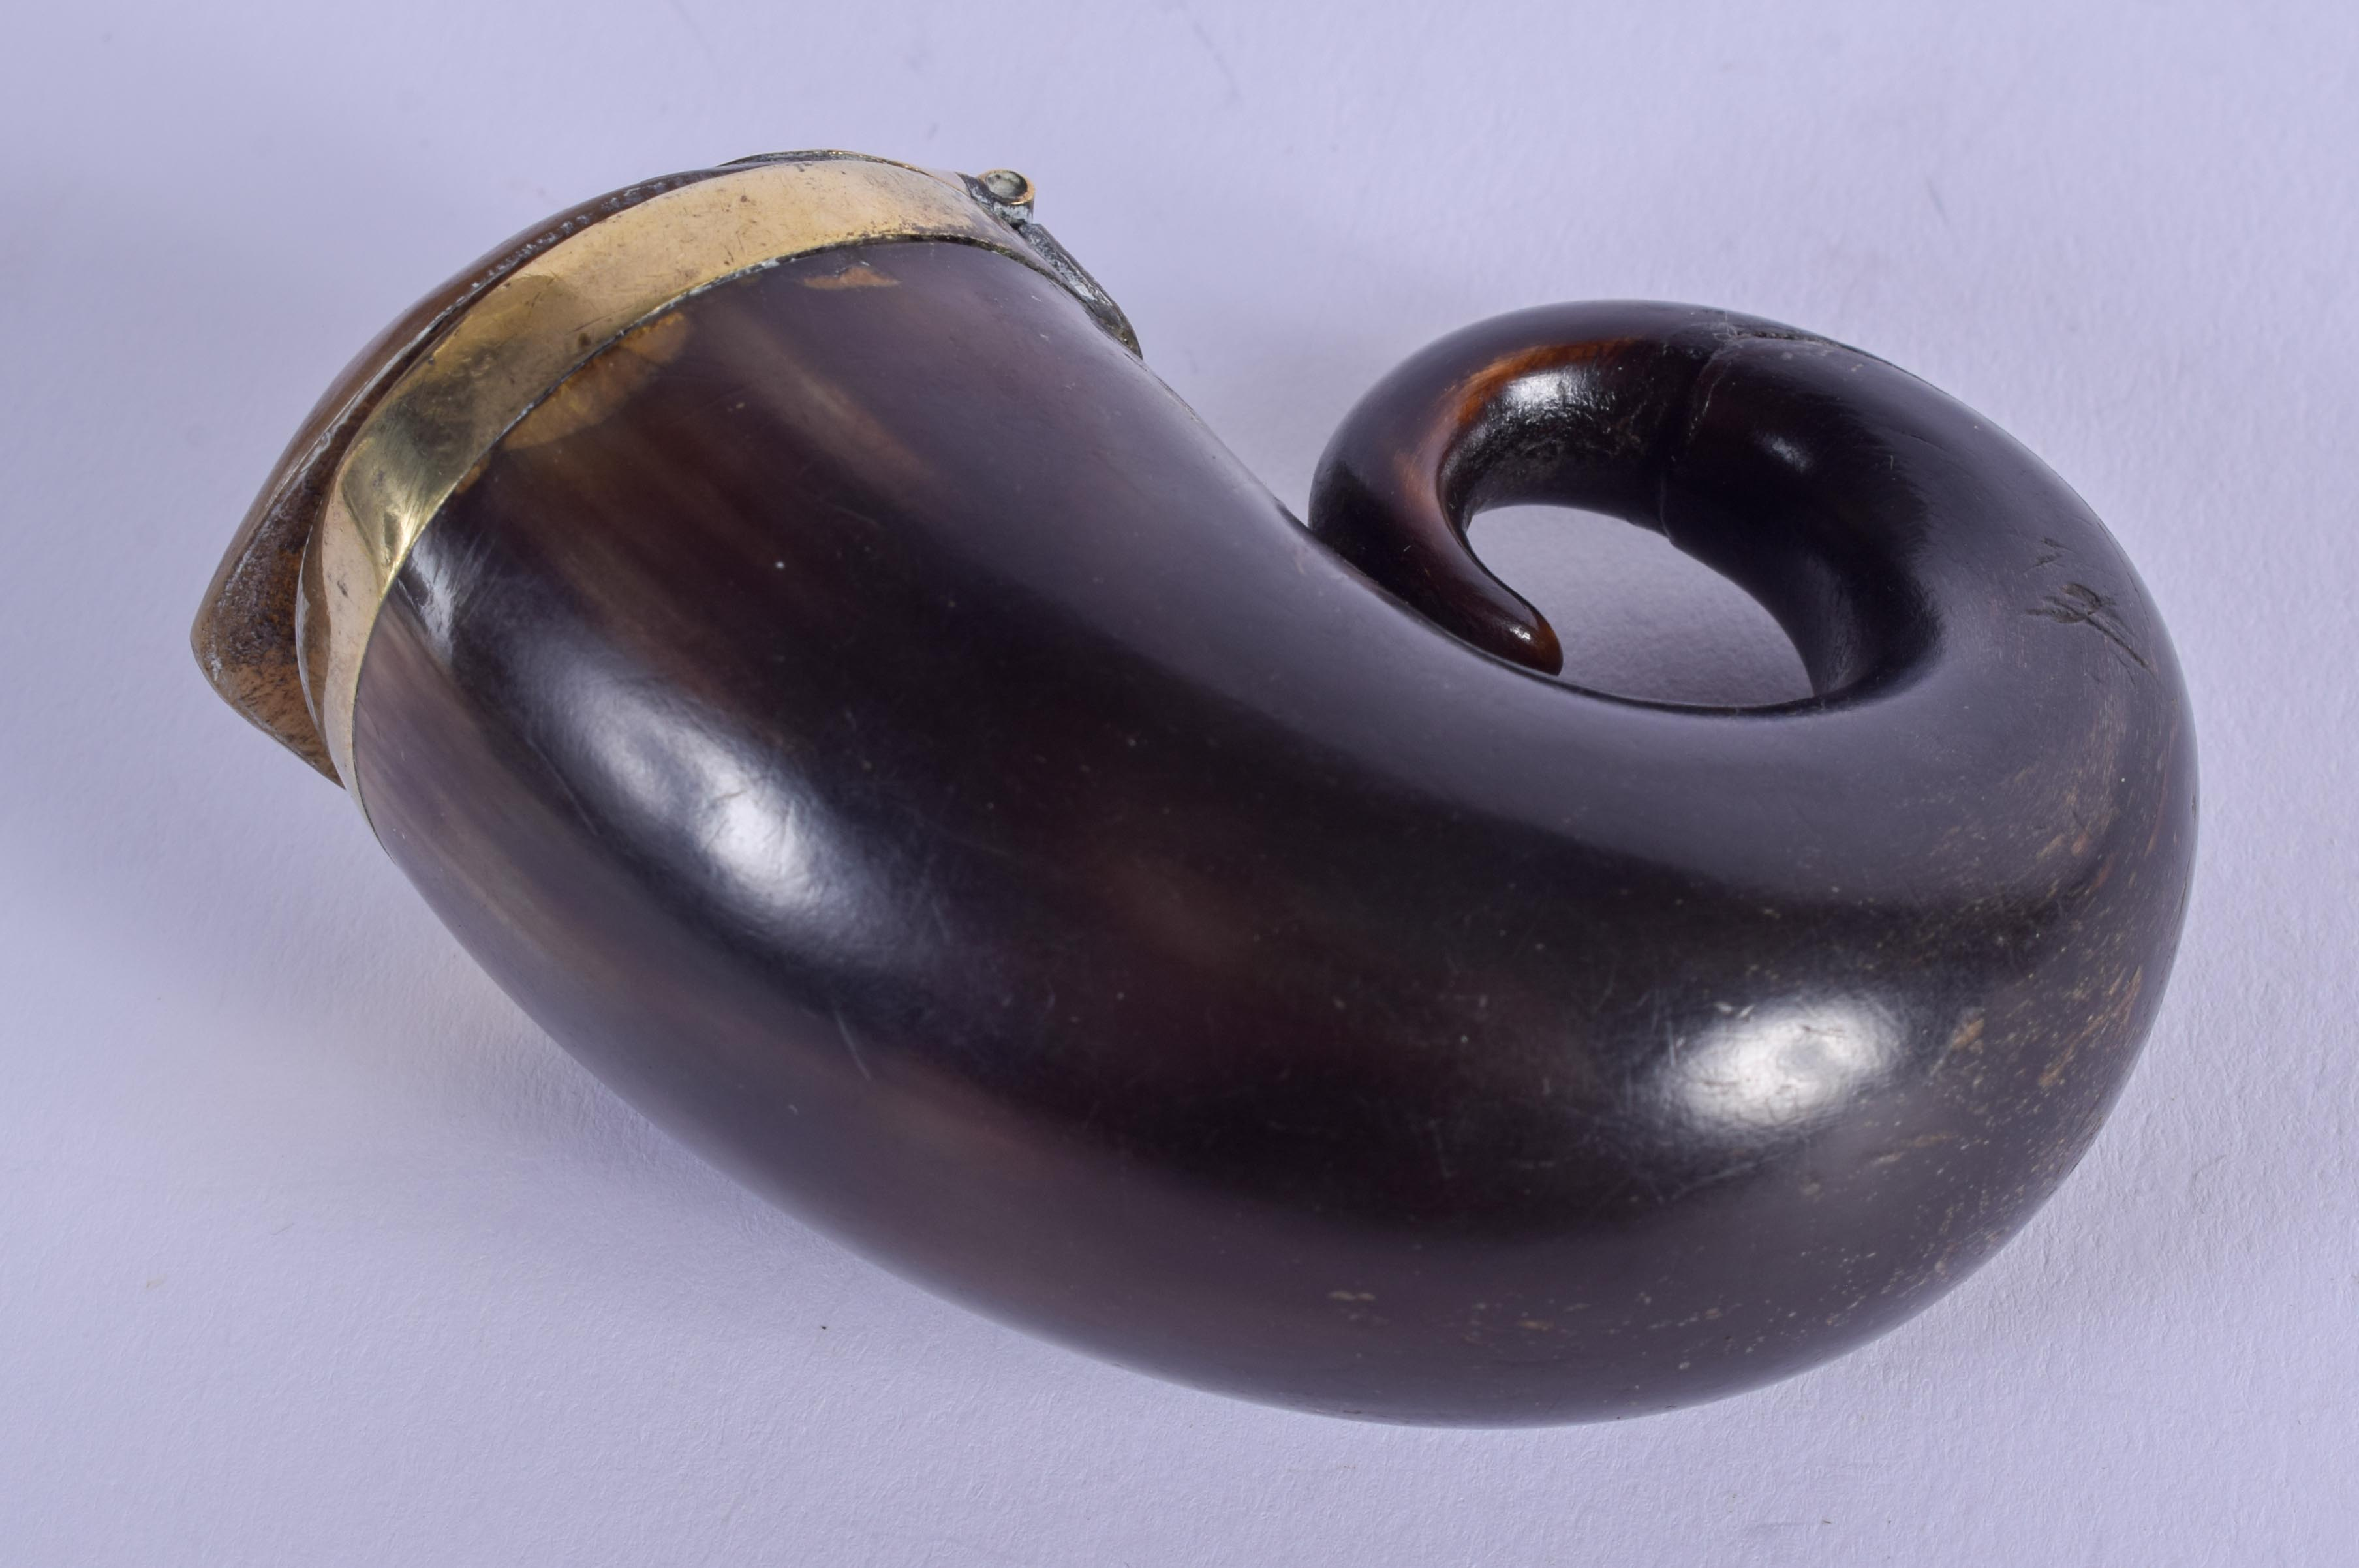 AN ANTIQUE SCOTTISH HORN SNUFF MULL. 6 cm x 6.5 cm. - Image 2 of 3